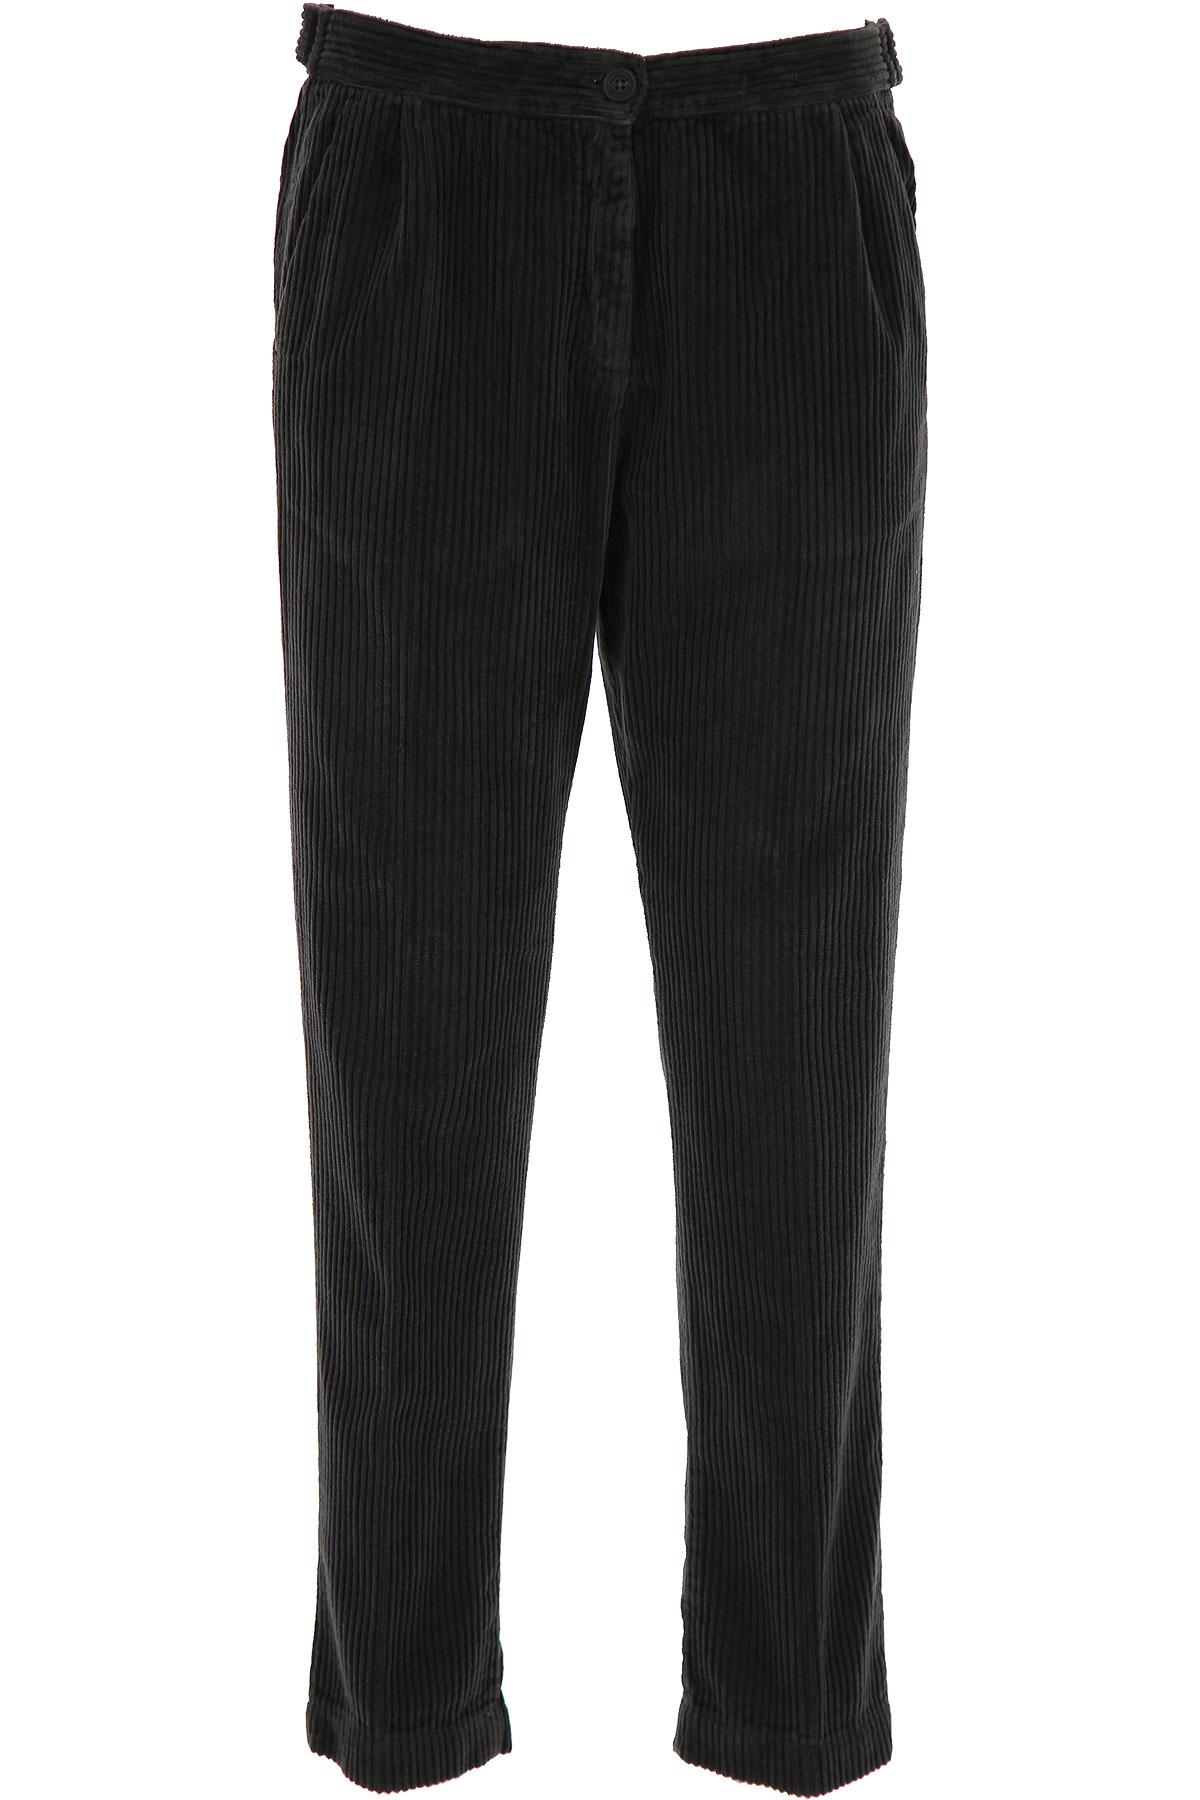 Massimo Alba Pants for Women On Sale, Carbon, Cotton, 2019, 30 32